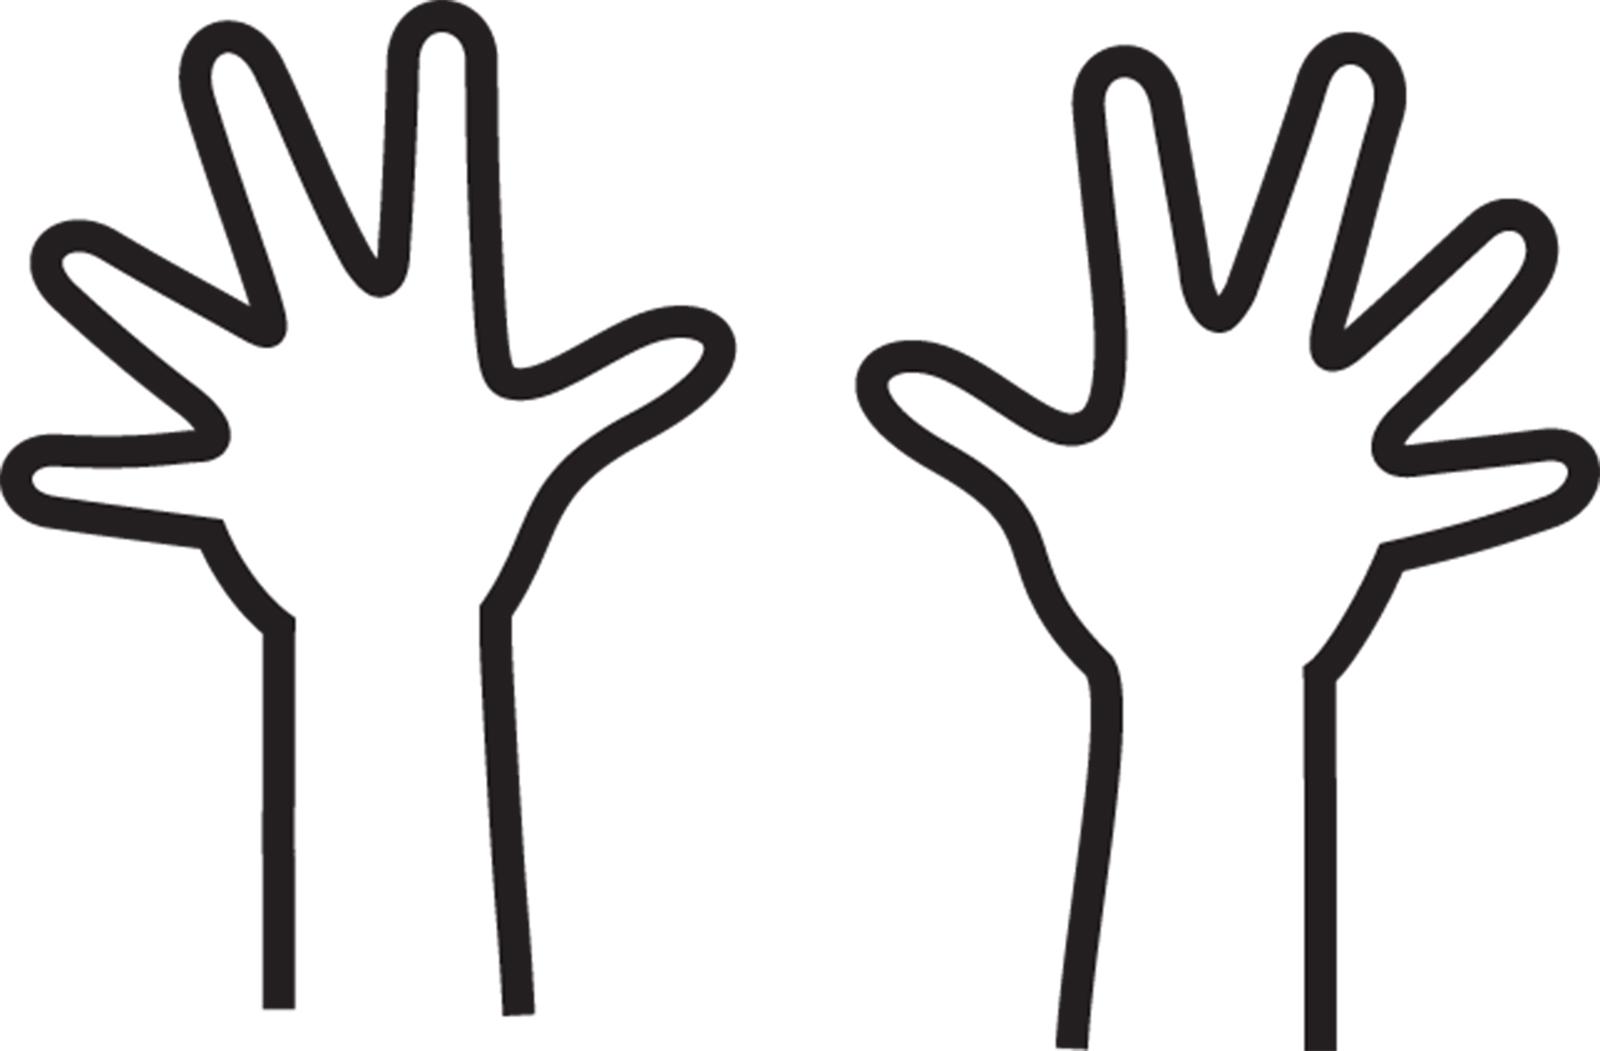 Hands Outline.